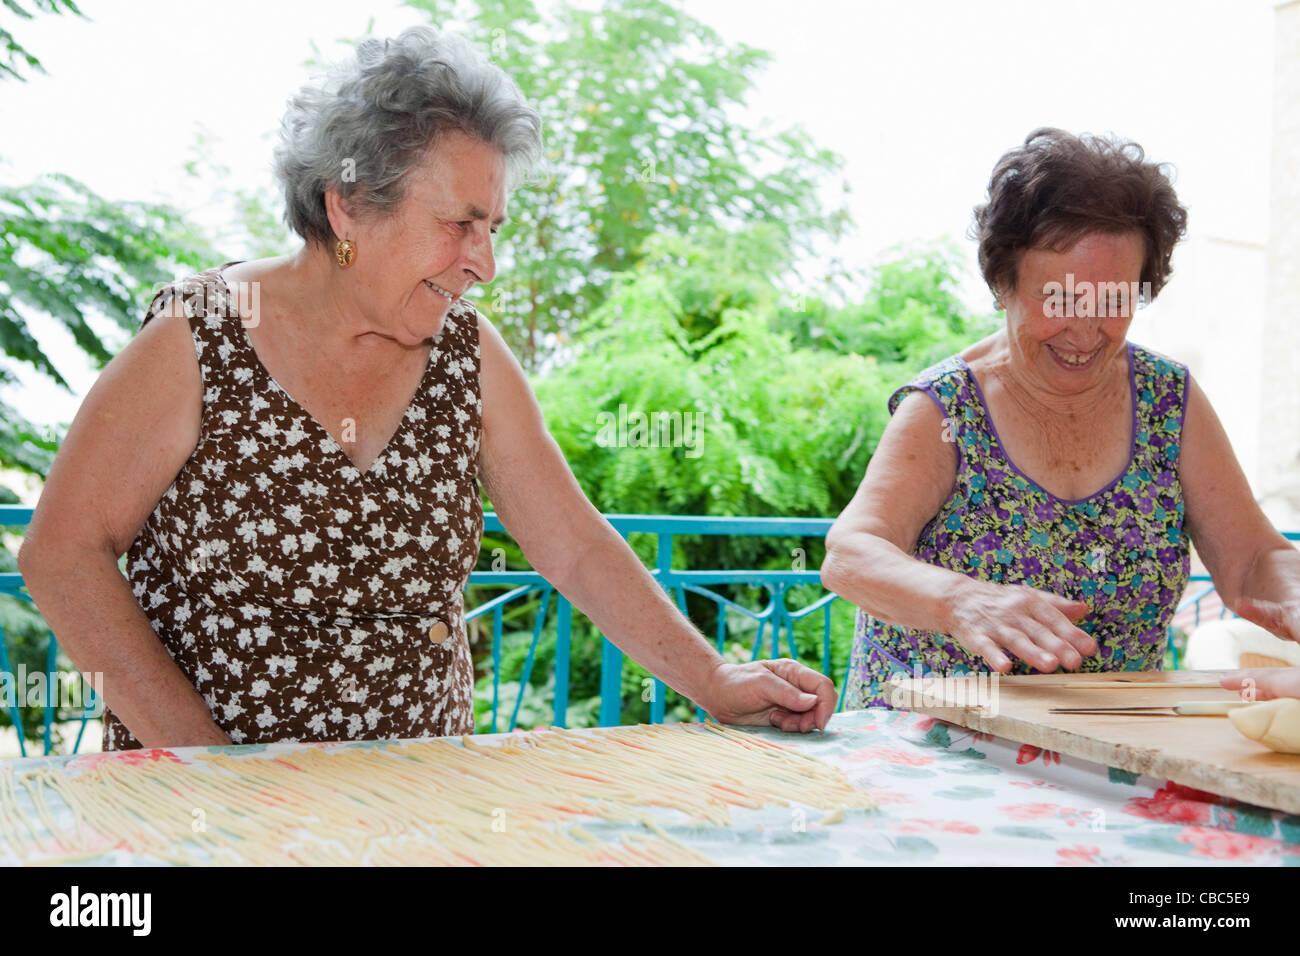 Older women making pasta together - Stock Image